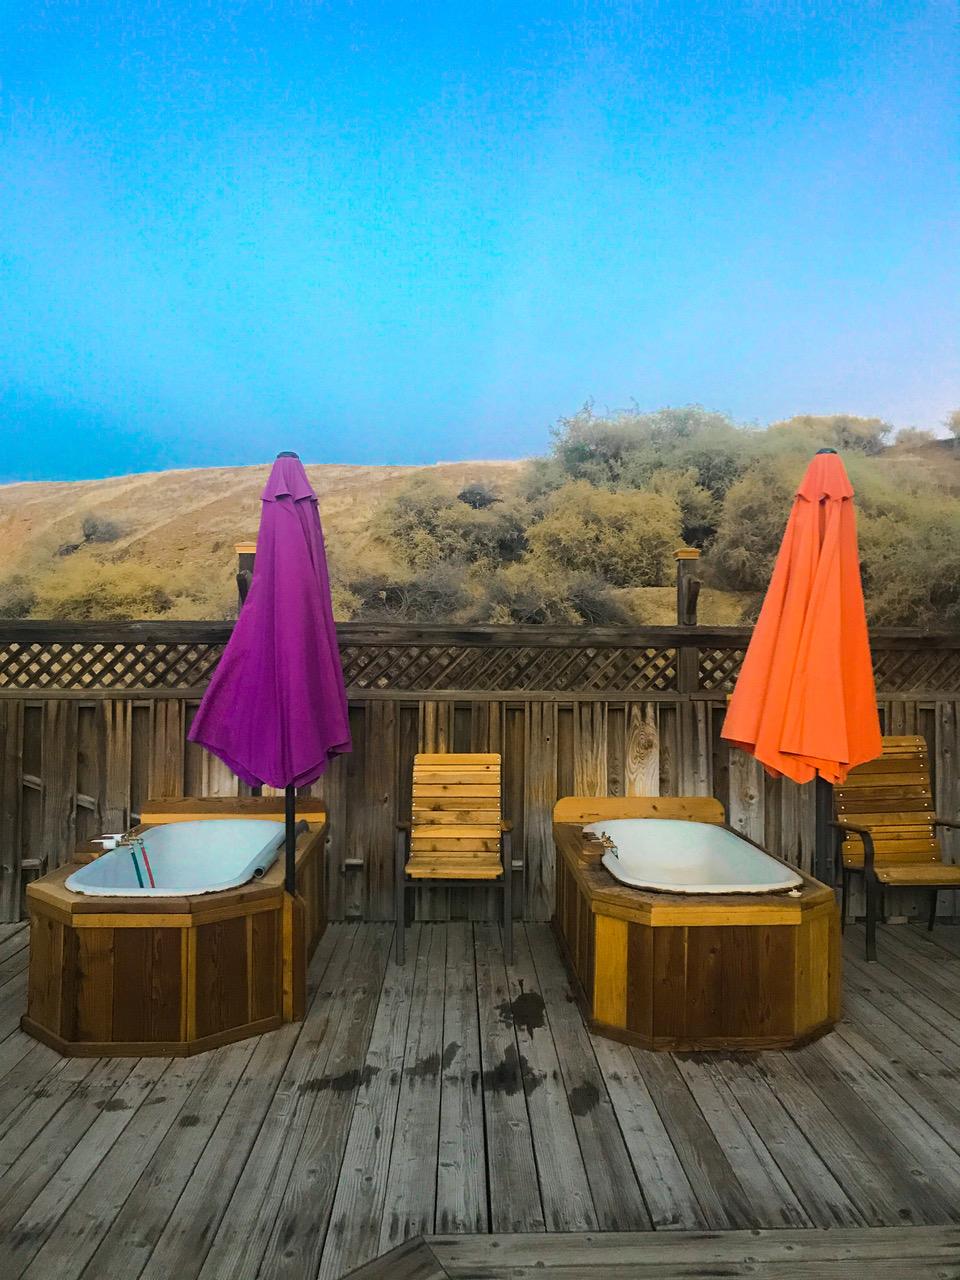 Purple and orange umbrellas and hot tubs